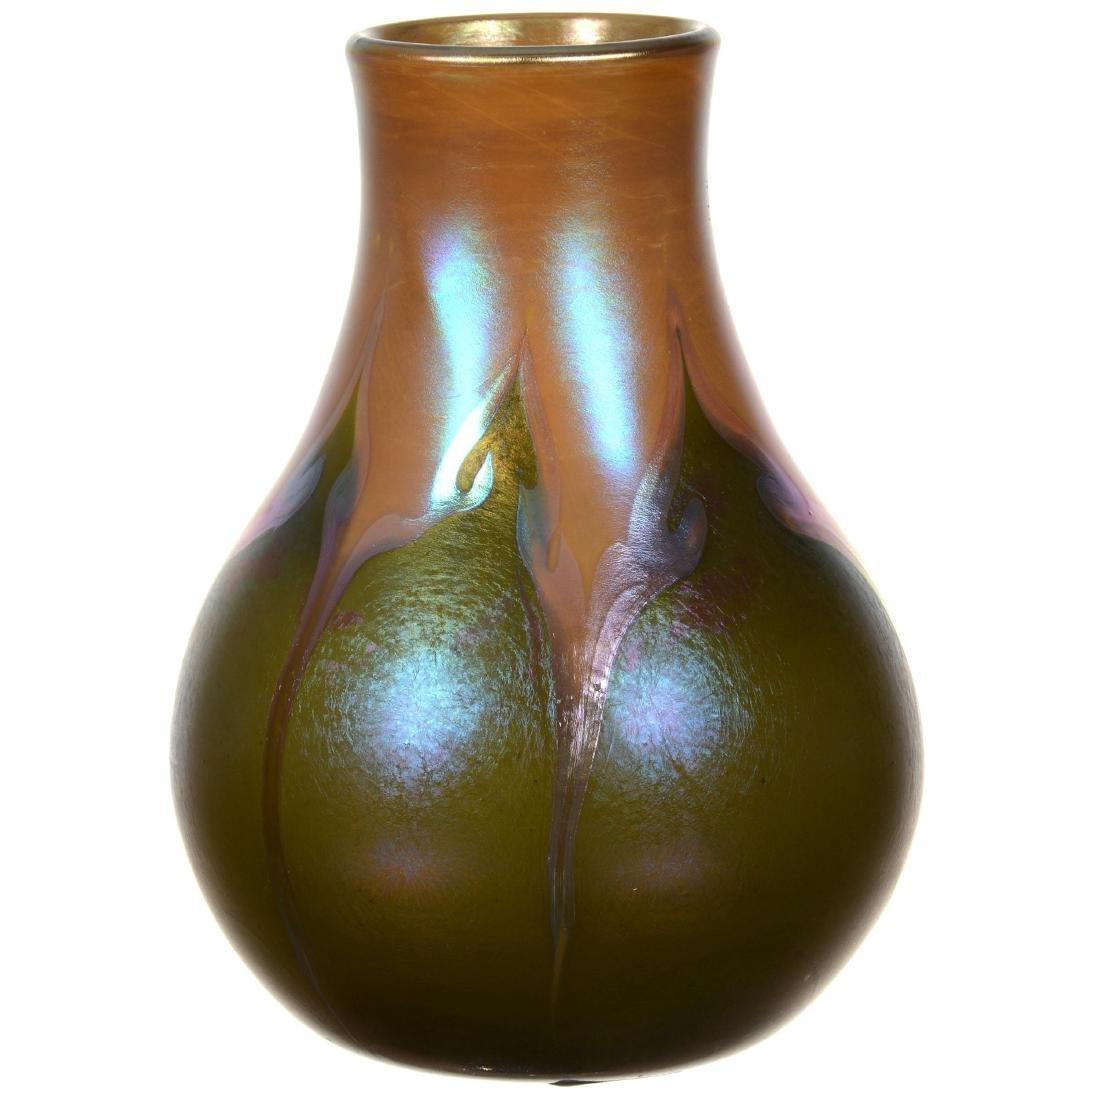 Unmarked Tiffany Style Art Glass Vase